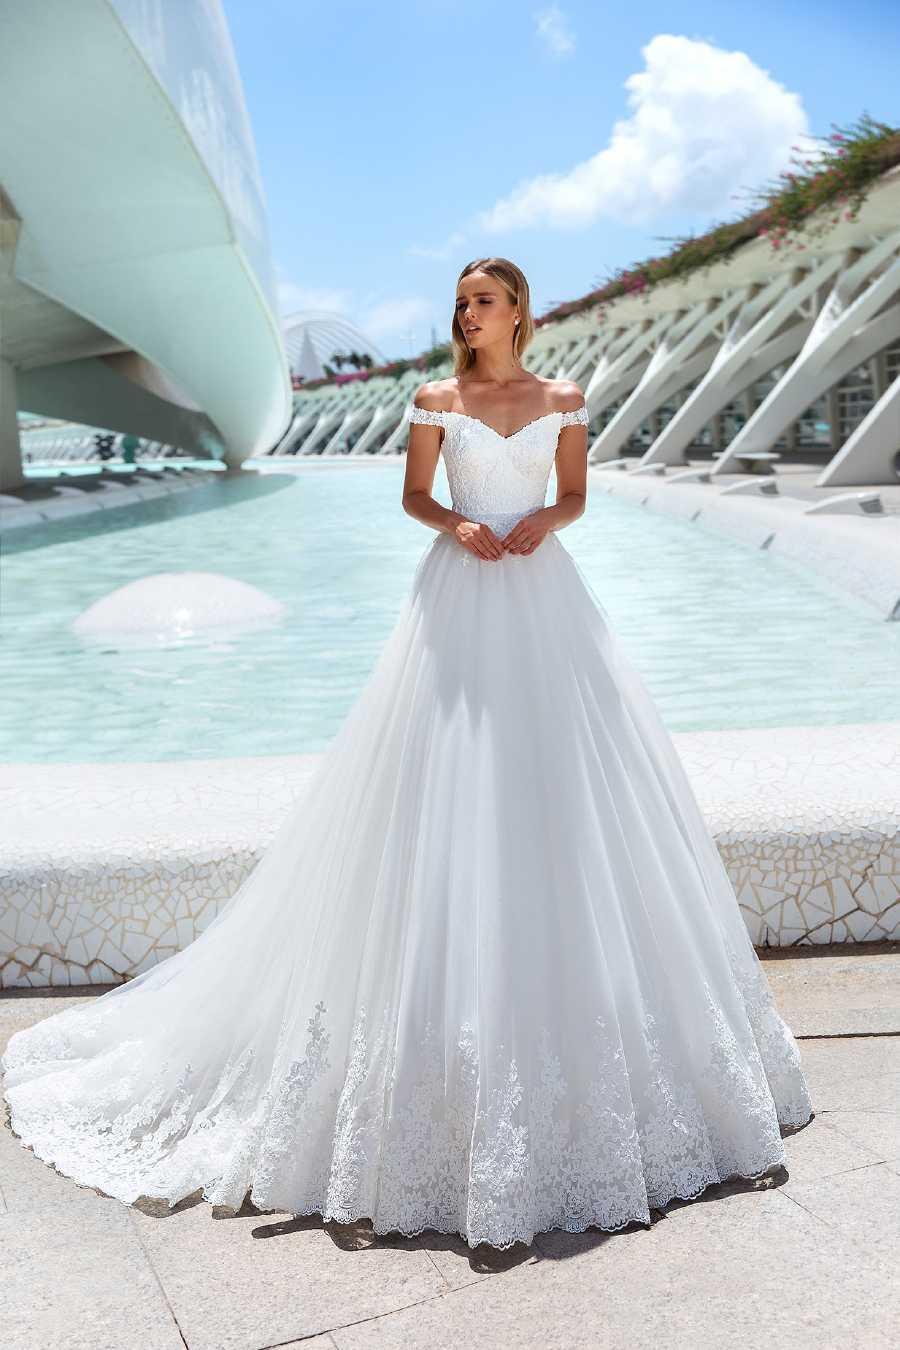 Vente De Robes De Mariee A Domicile Lady Bride